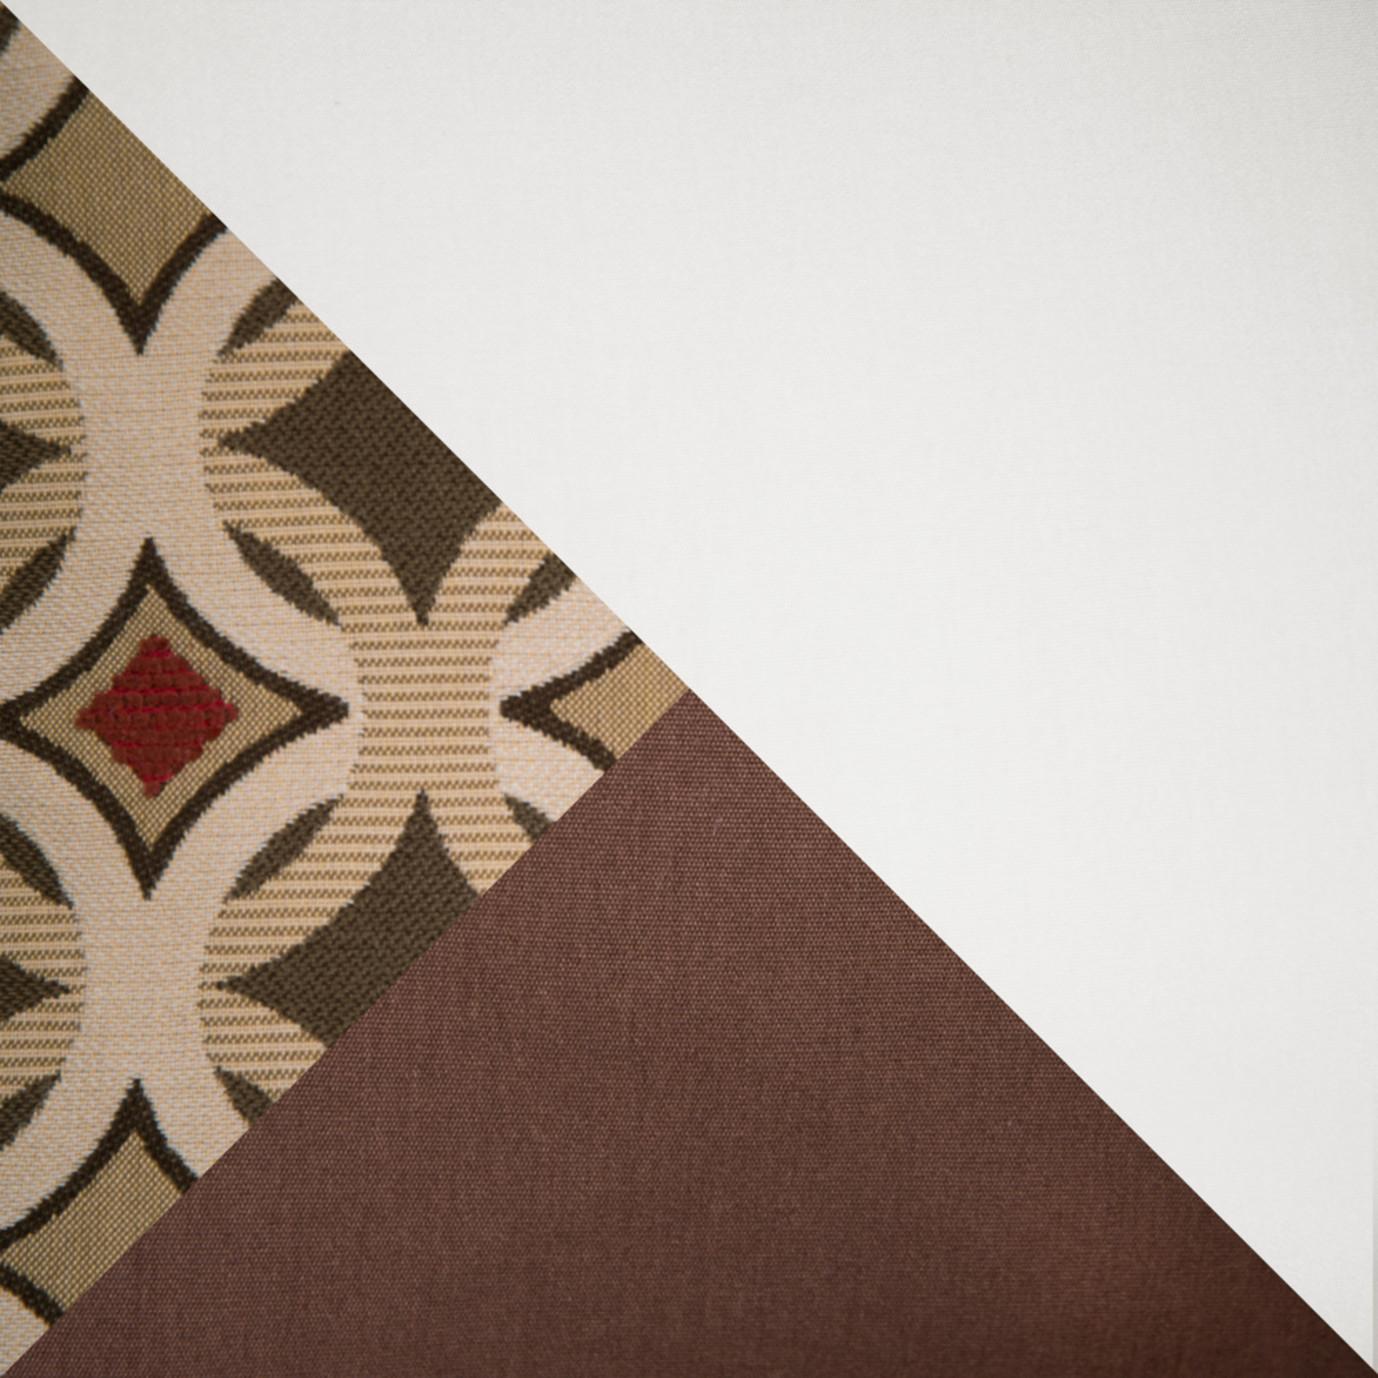 Deco™ 6pc Love and Club Seating Set - Moroccan Cream